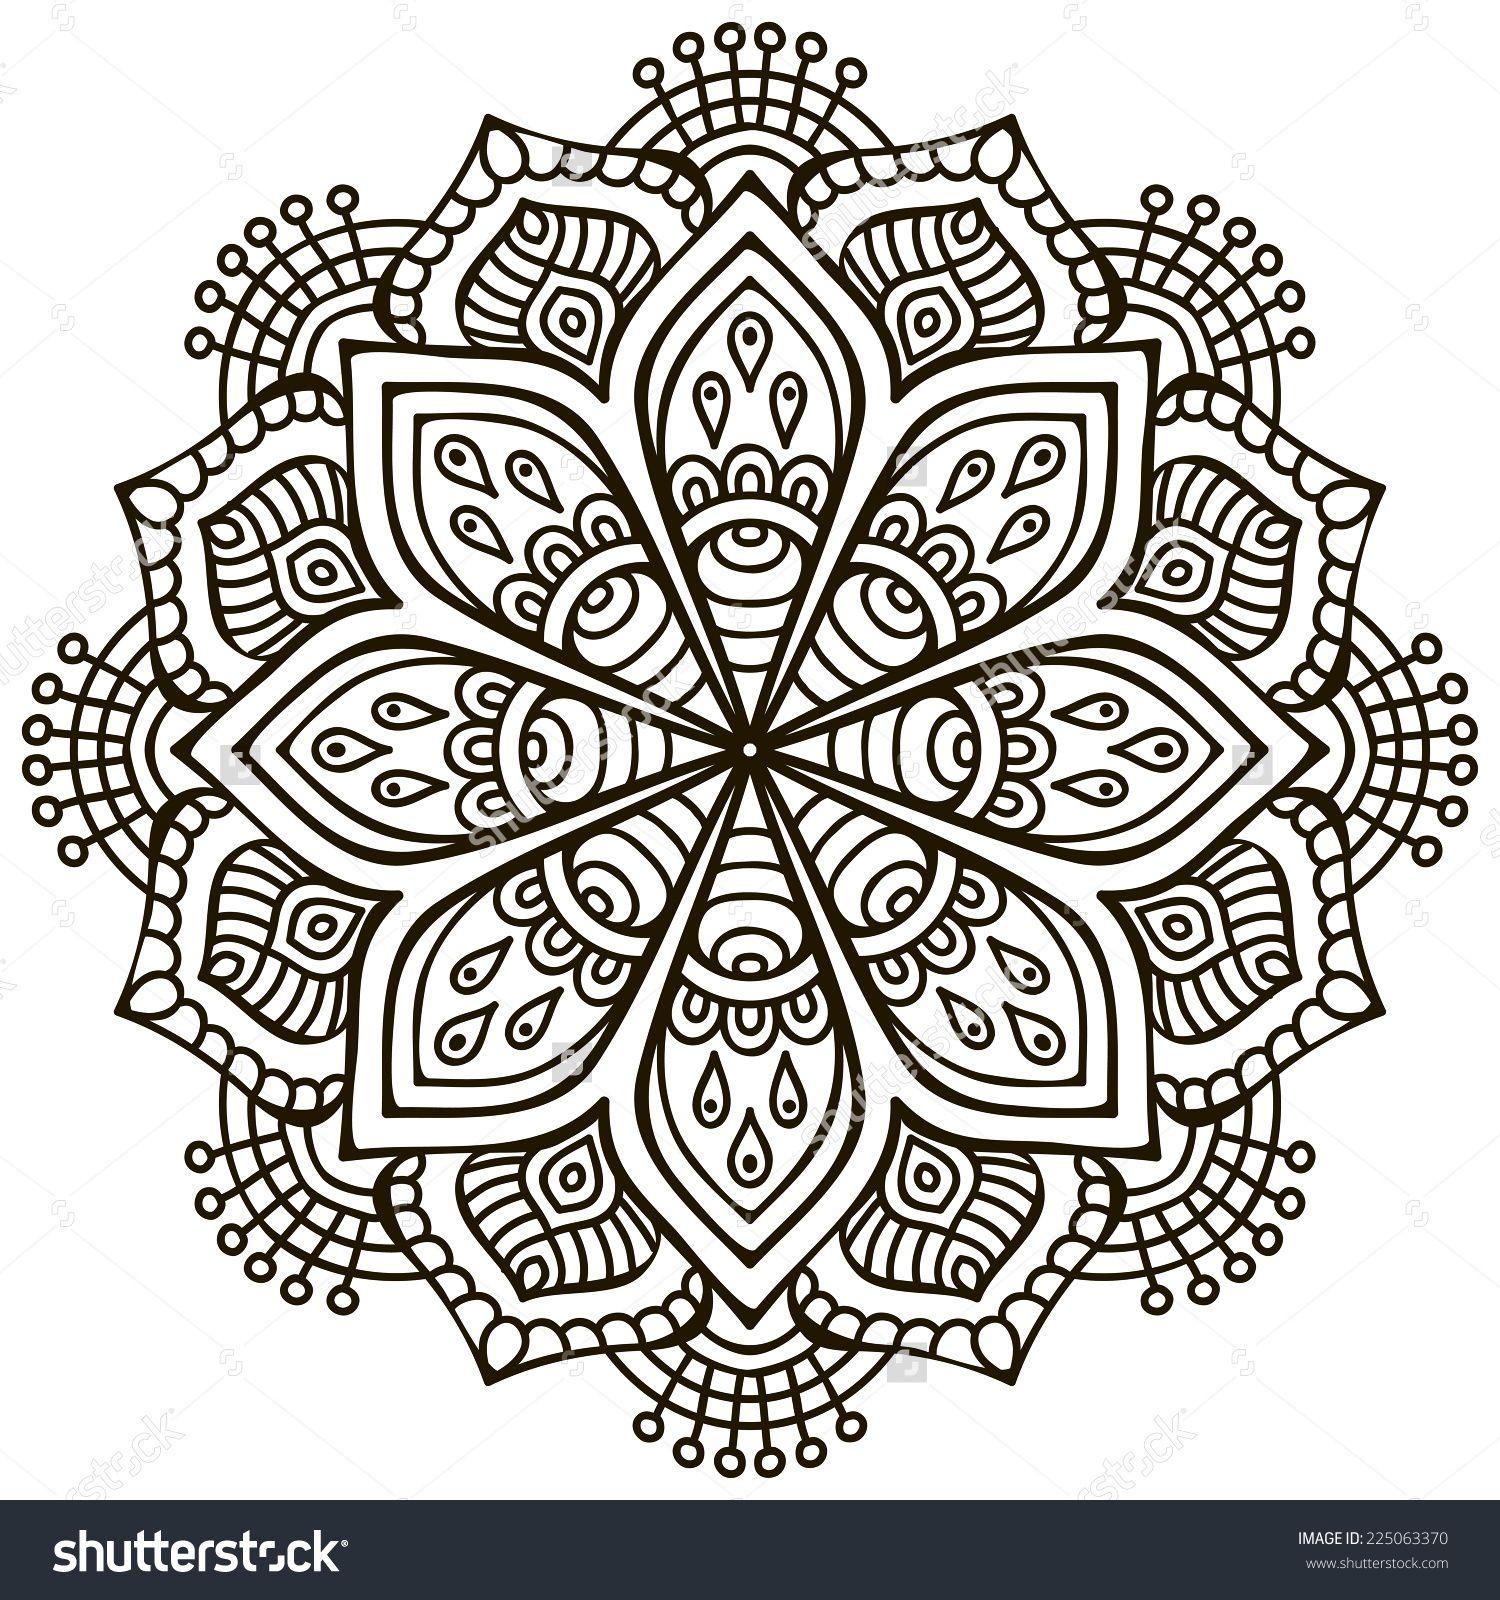 Vintage Patterns Coloring Pages. Craft mandala  coloring pictures Pinterest Mandala Adult